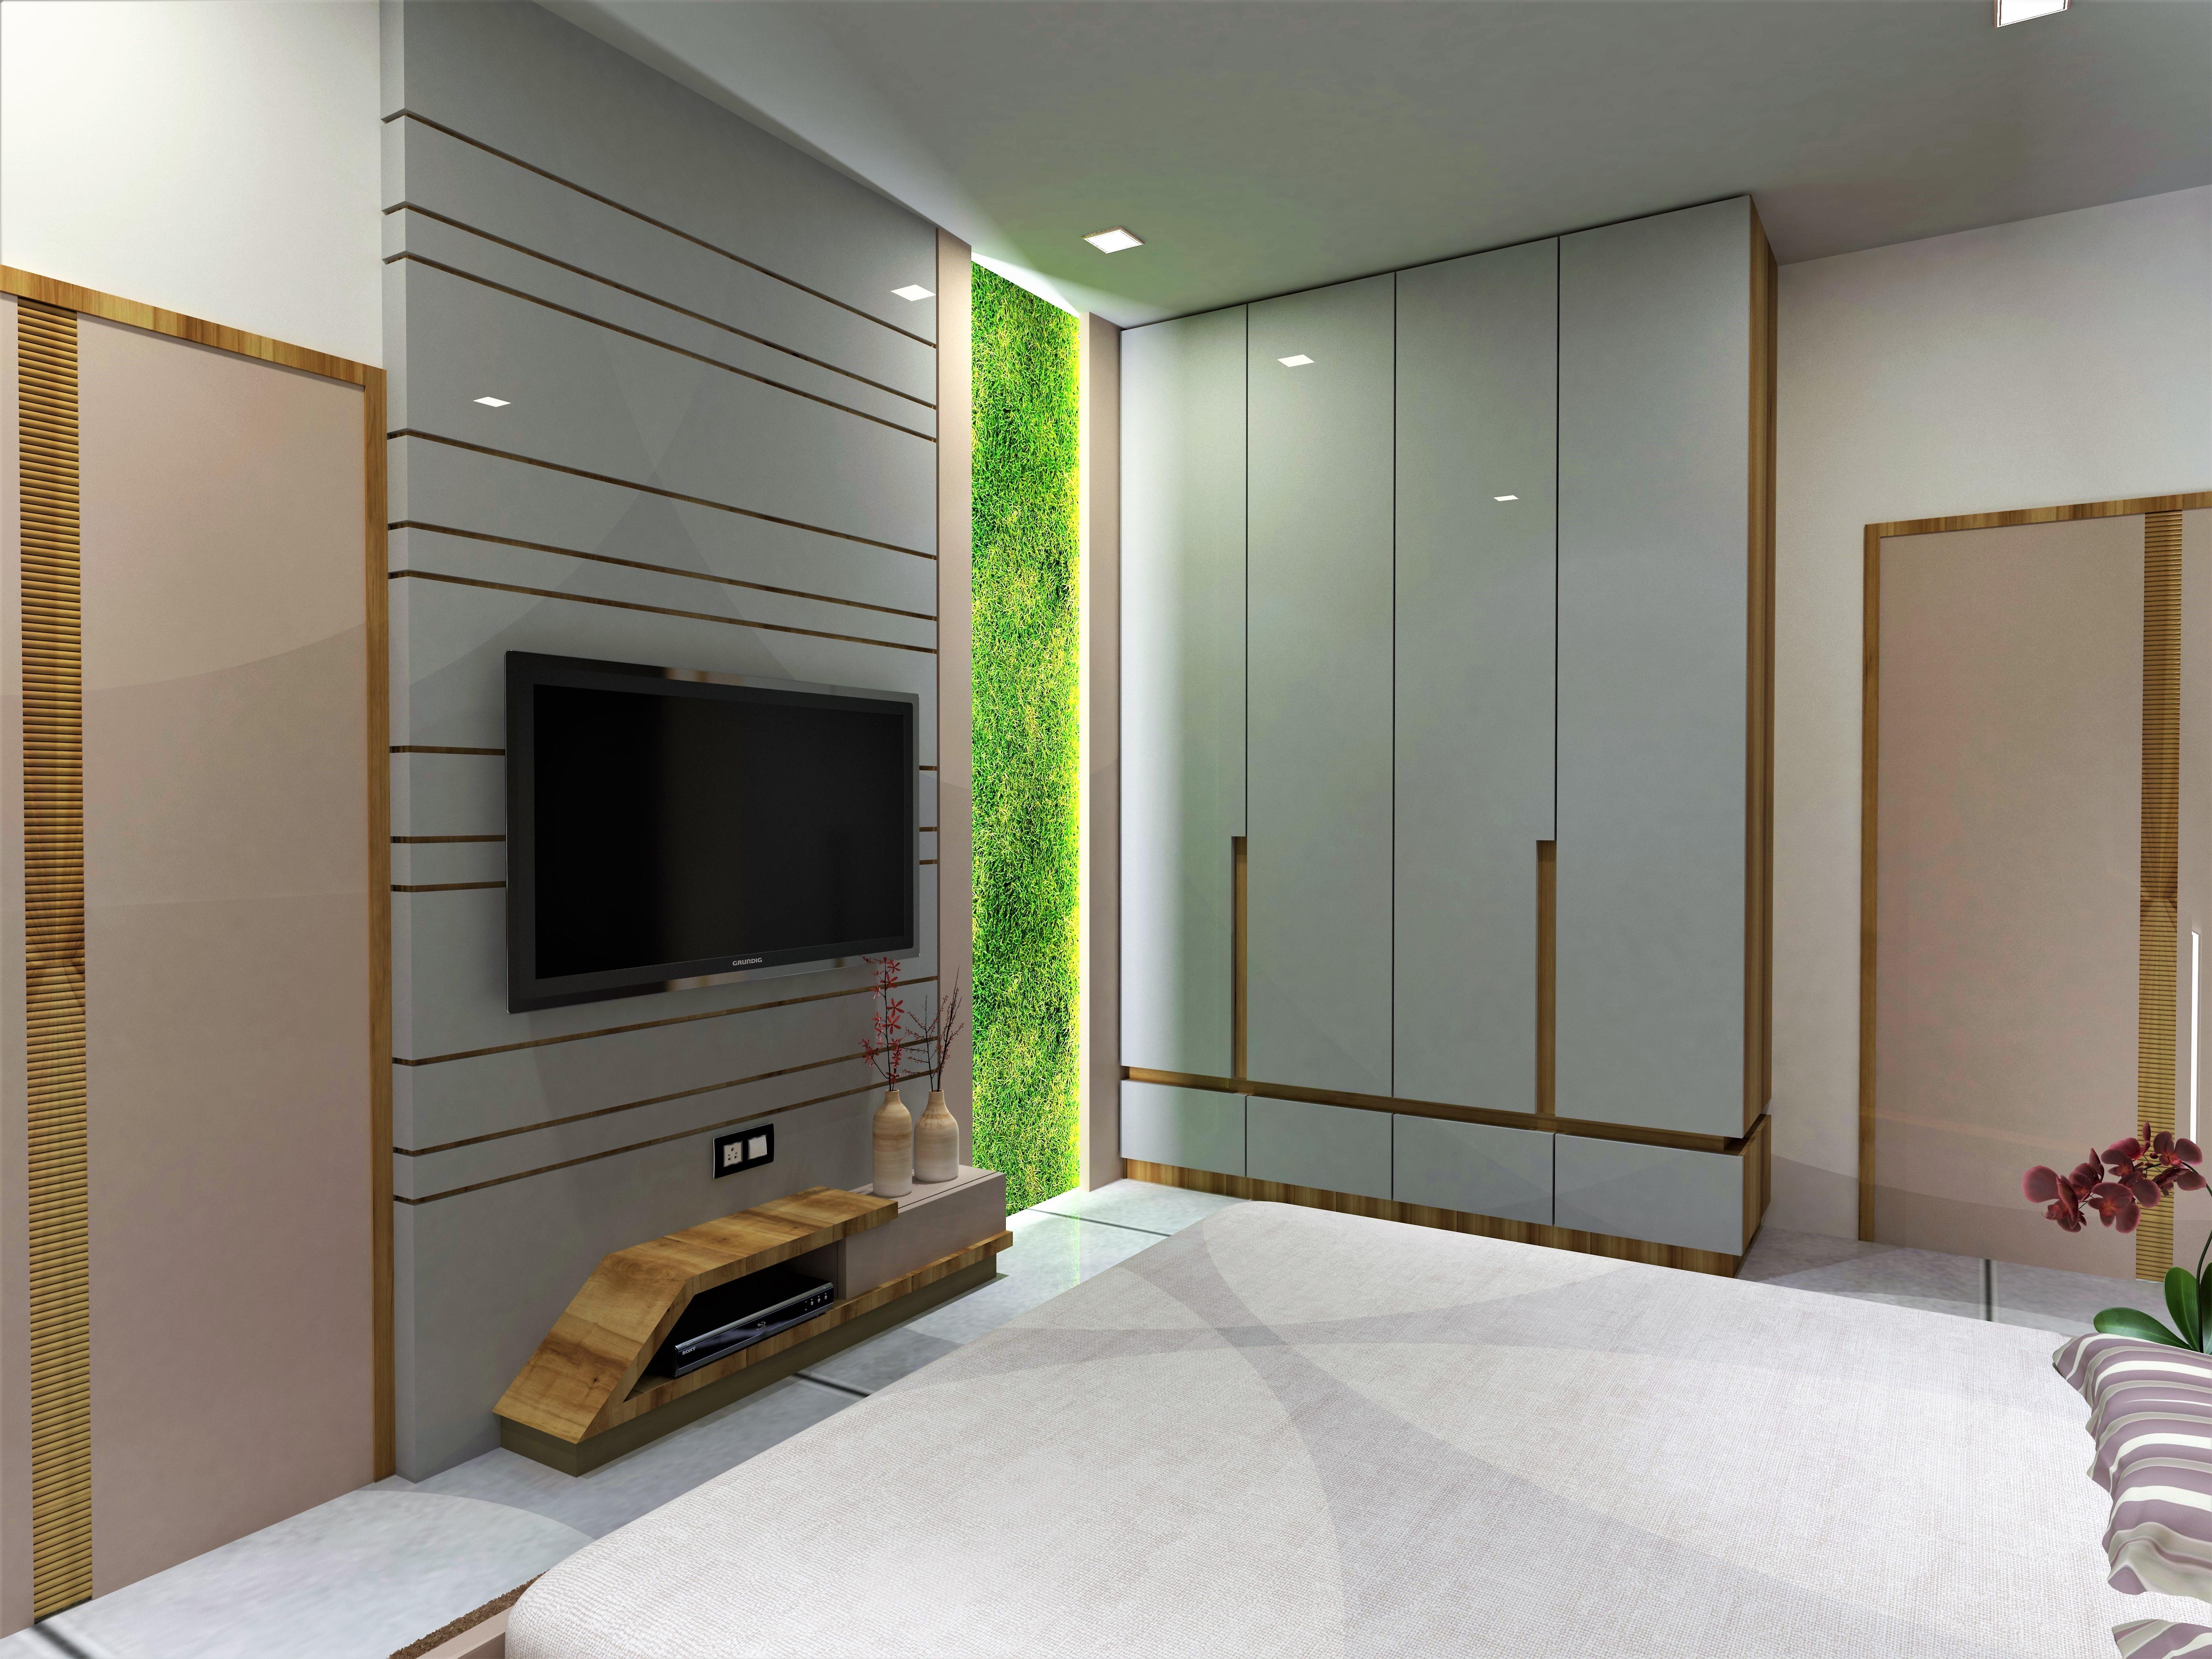 Modern Bedrooms Interior Design